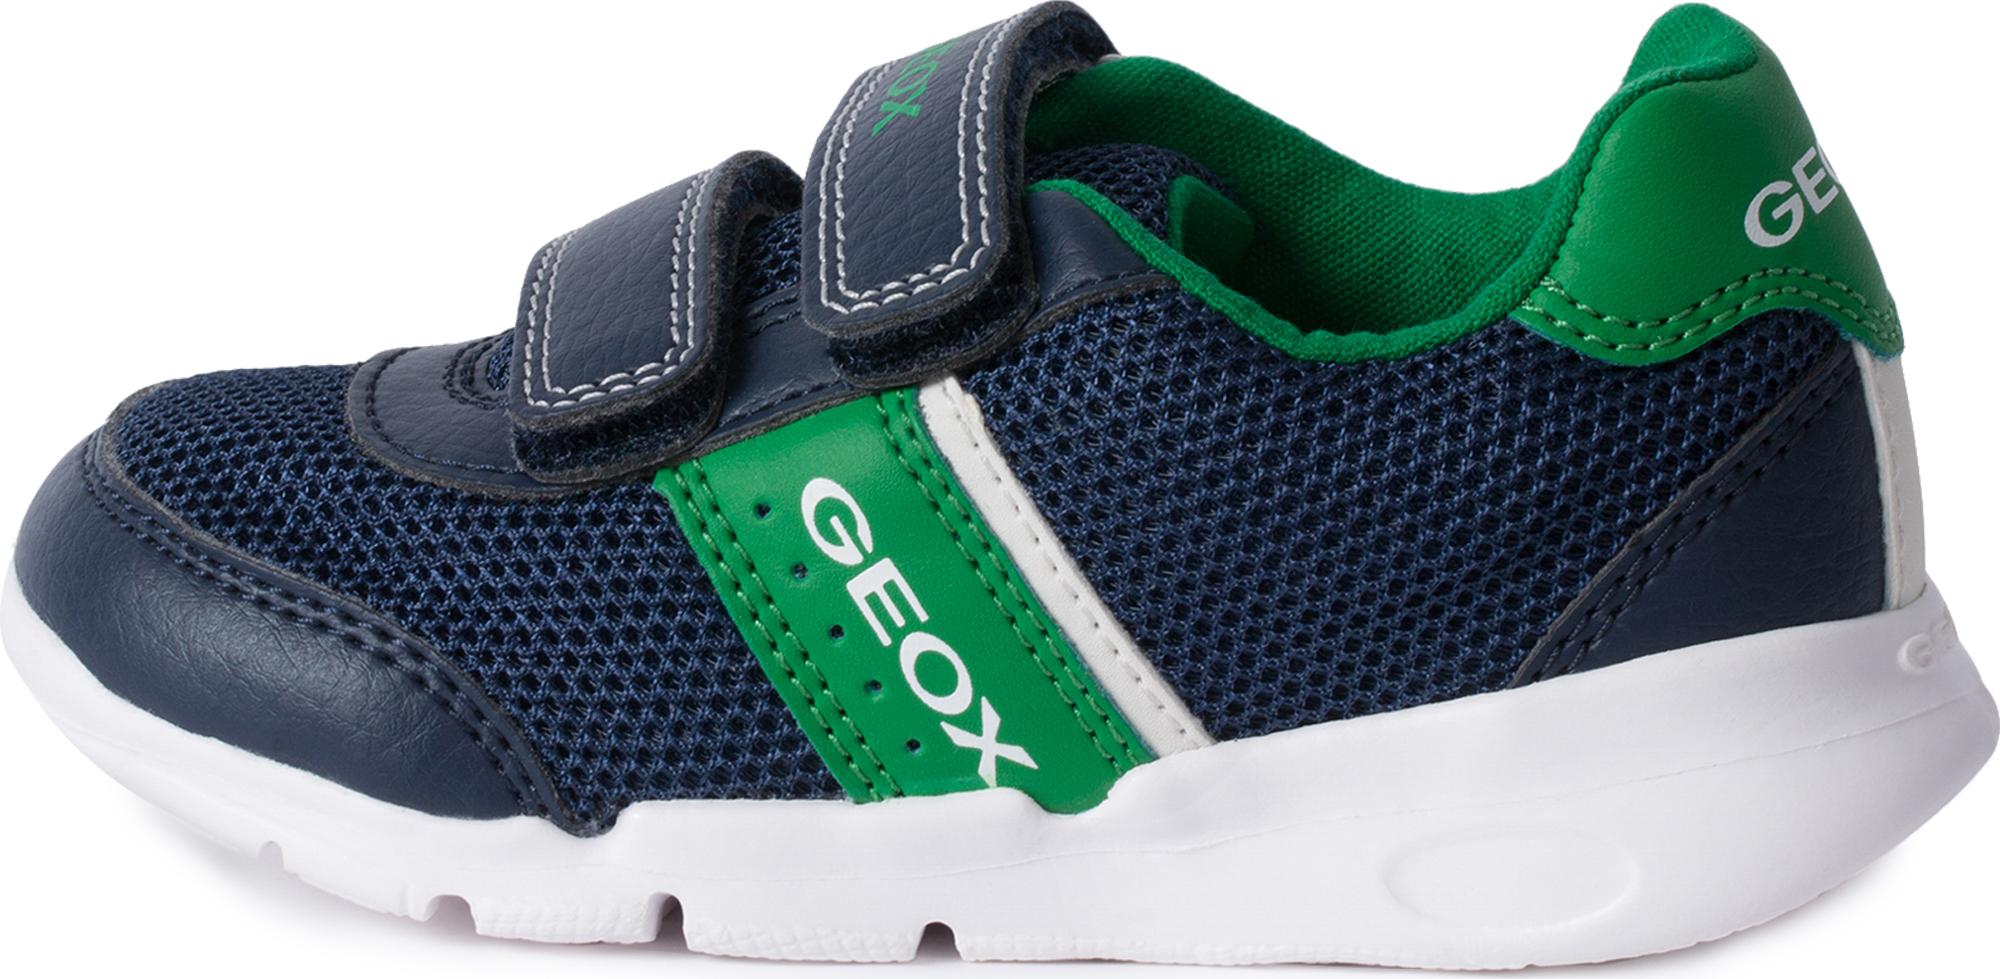 цена на Geox Кроссовки для мальчиков Geox Runner, размер 26